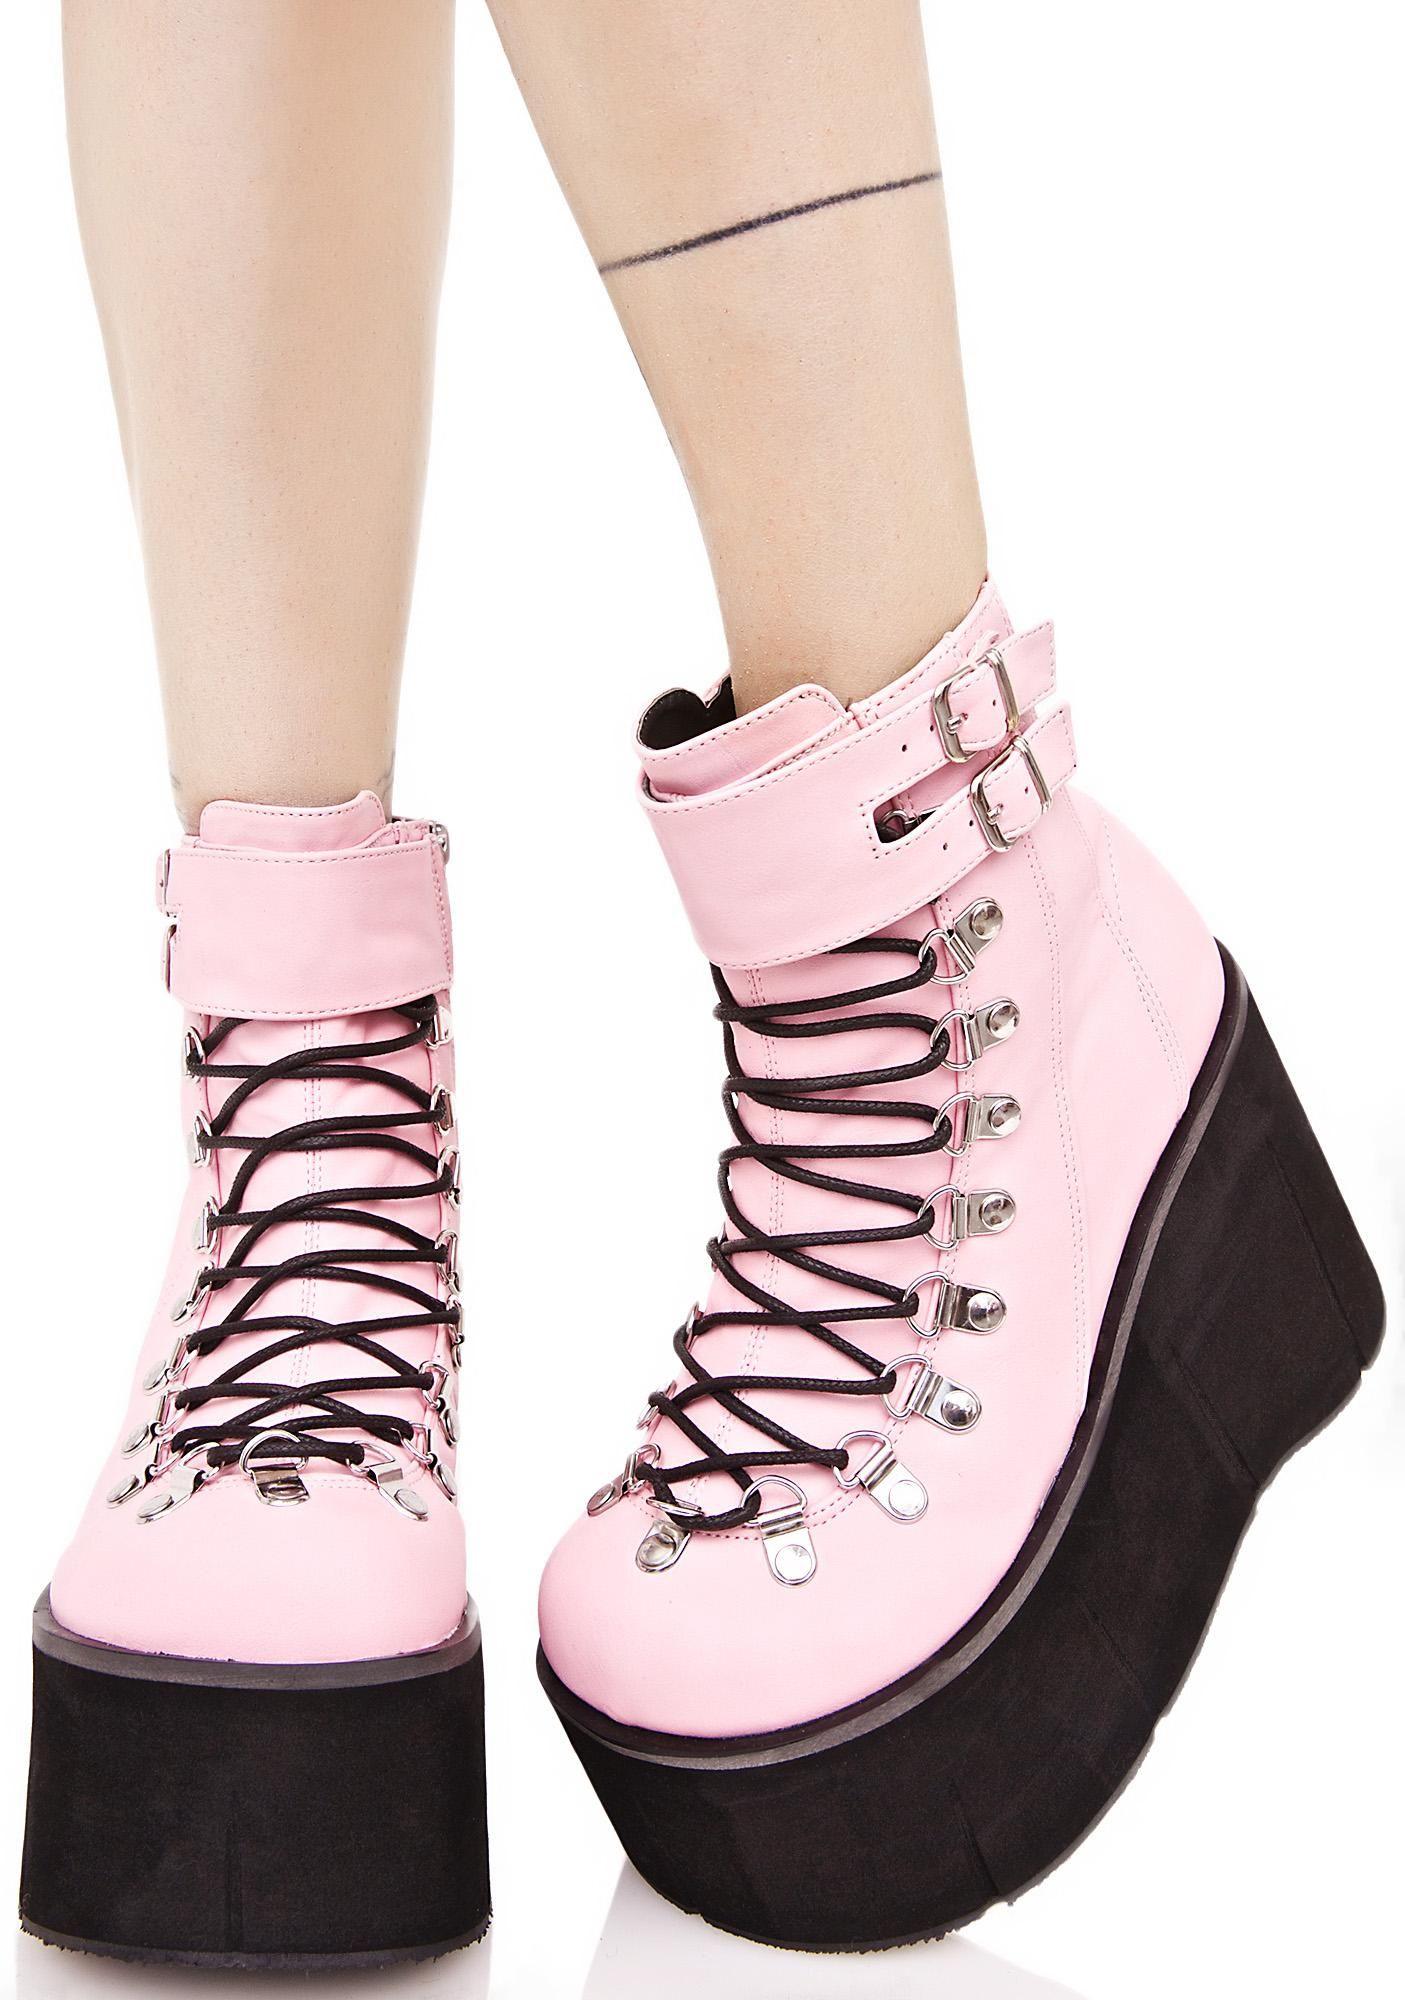 Sweetie Kera Lace-Up Platform Boots in 2019  c1d113f0e6d9